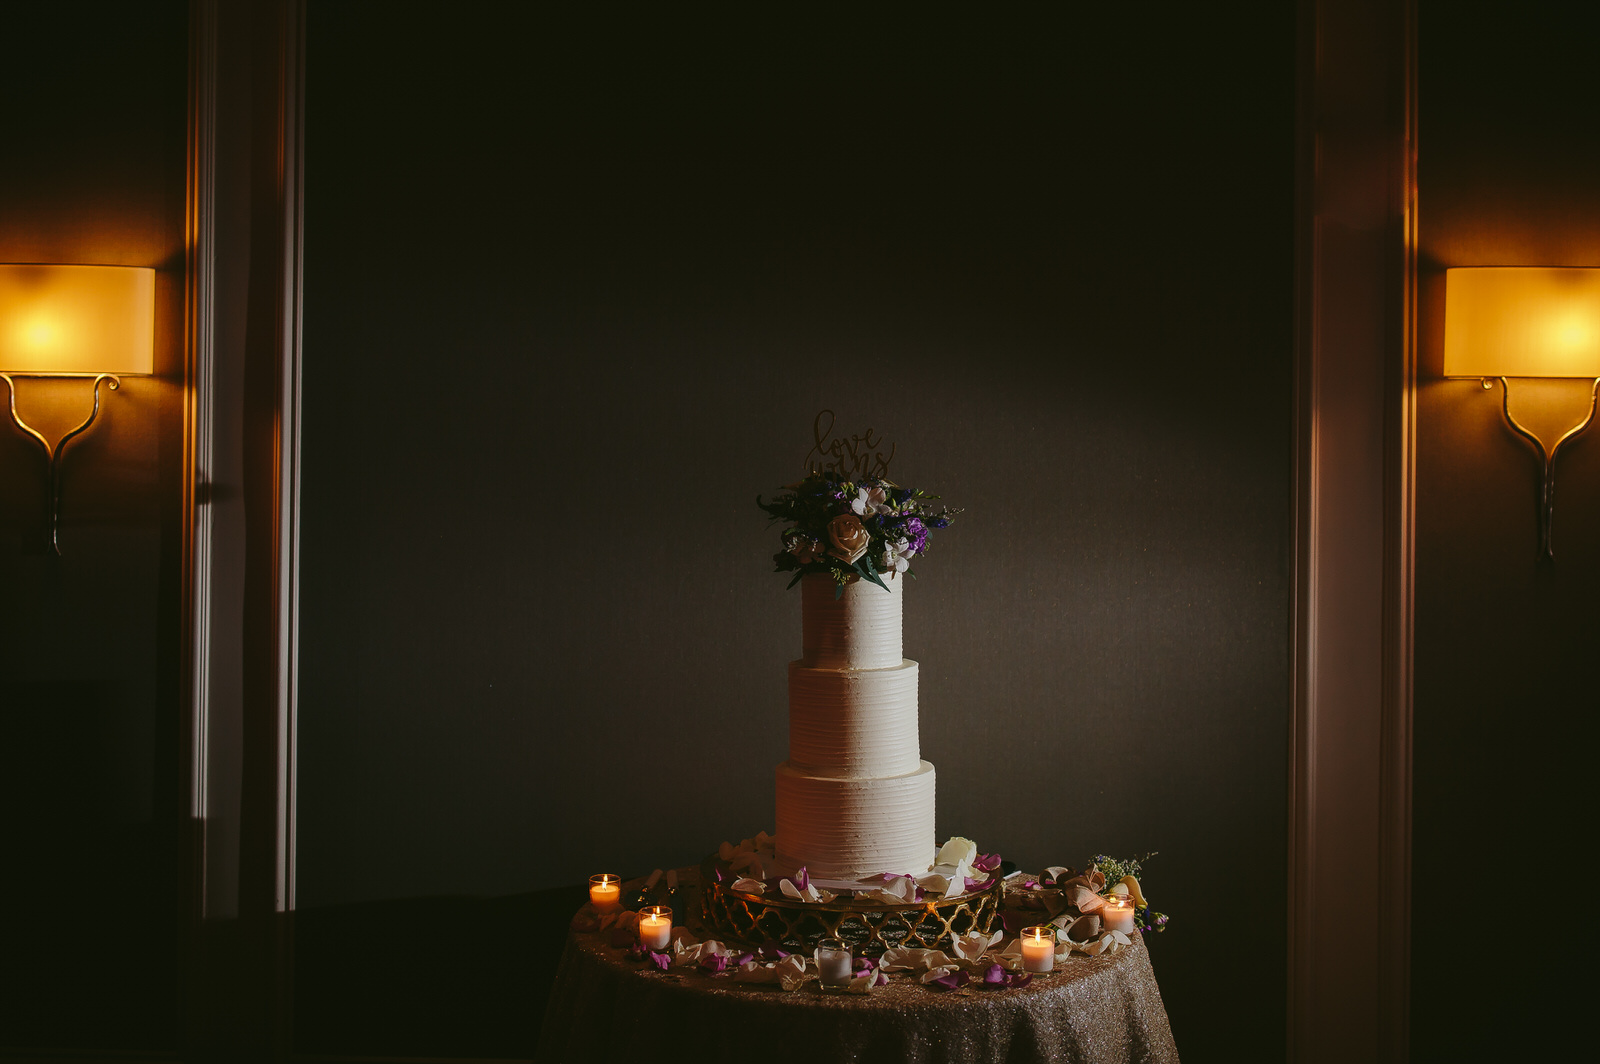 tiny_house_photo_wedding_cake_portrait_details_boca_raton.jpg